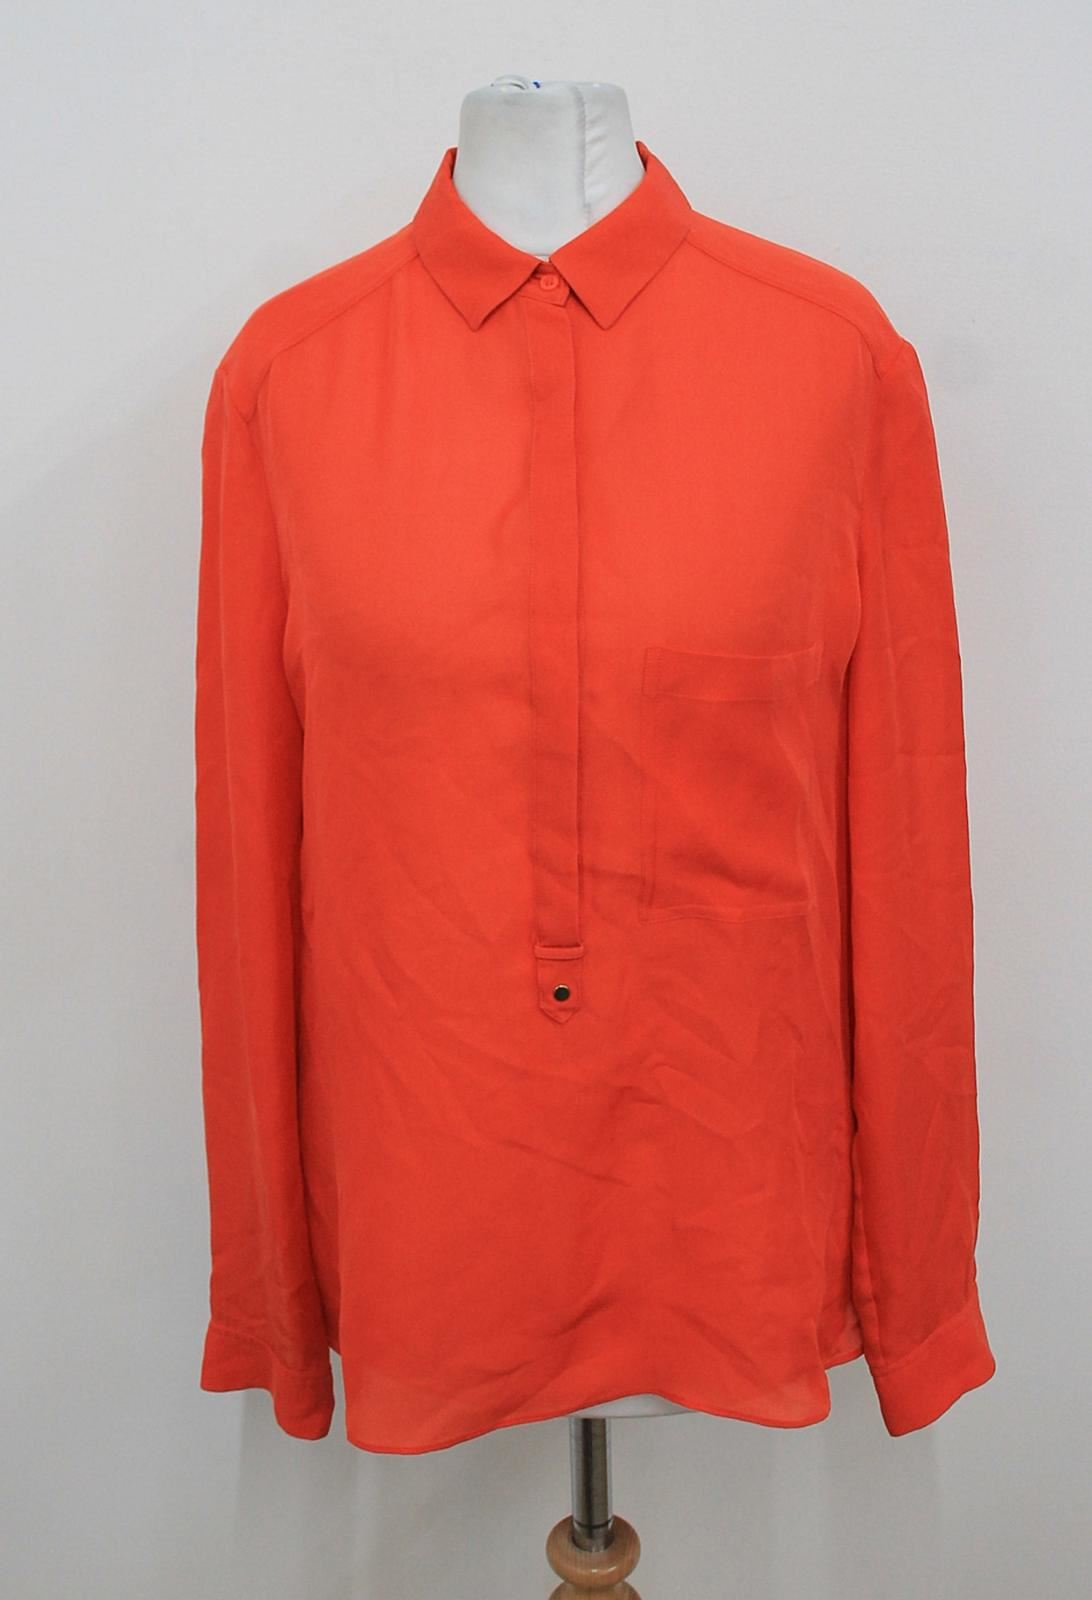 Massimo-Dutti-Damen-orange-langarm-Kragen-Seide-Shirt-Groesse-eu36-uk8